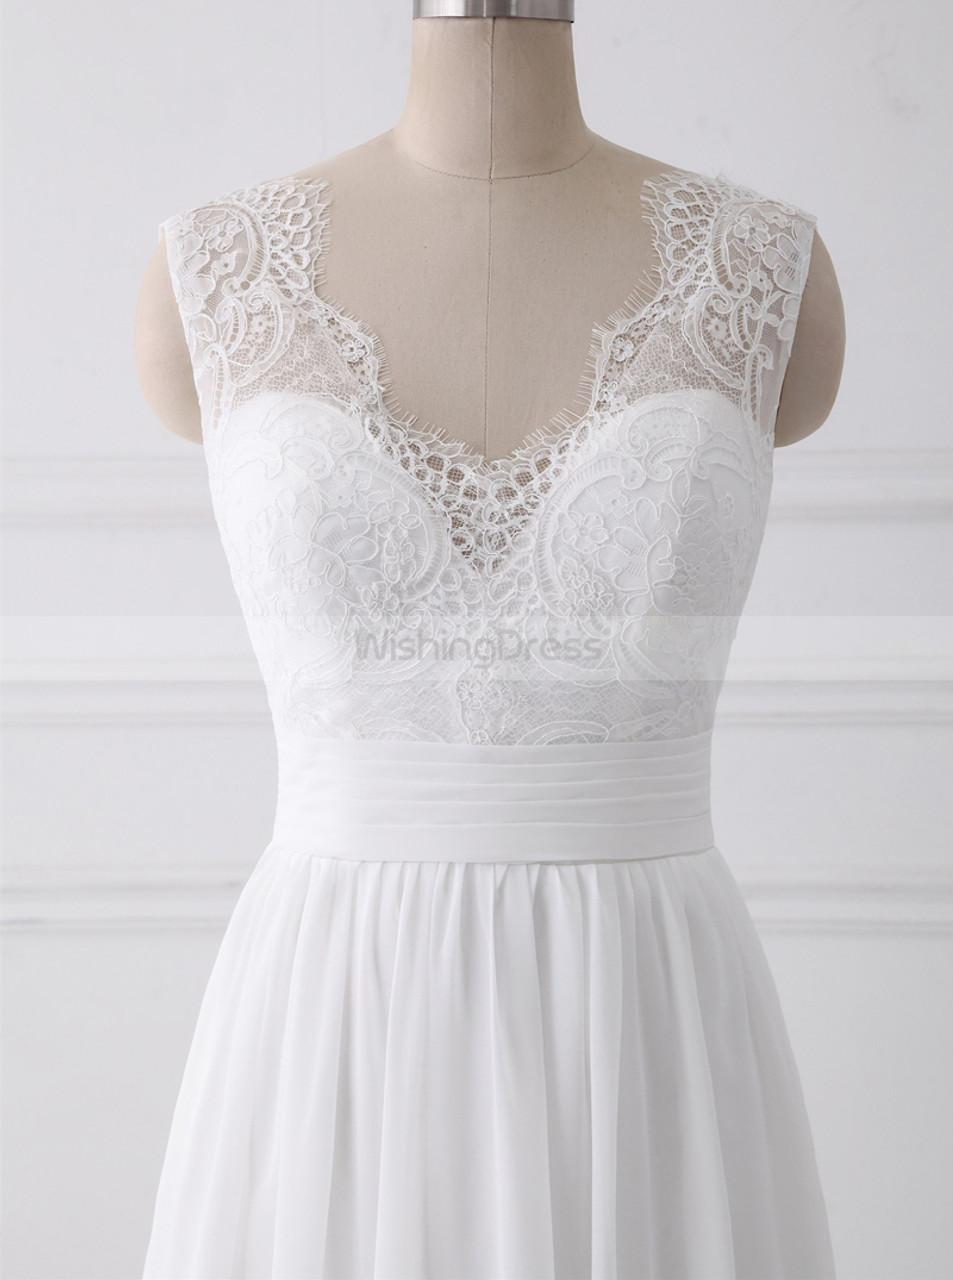 White Wedding Dresses Boho Wedding Dress Beach Bridal Dress Ld11111 Landress Co Uk,Second Hand Wedding Dresses Uk Size 18